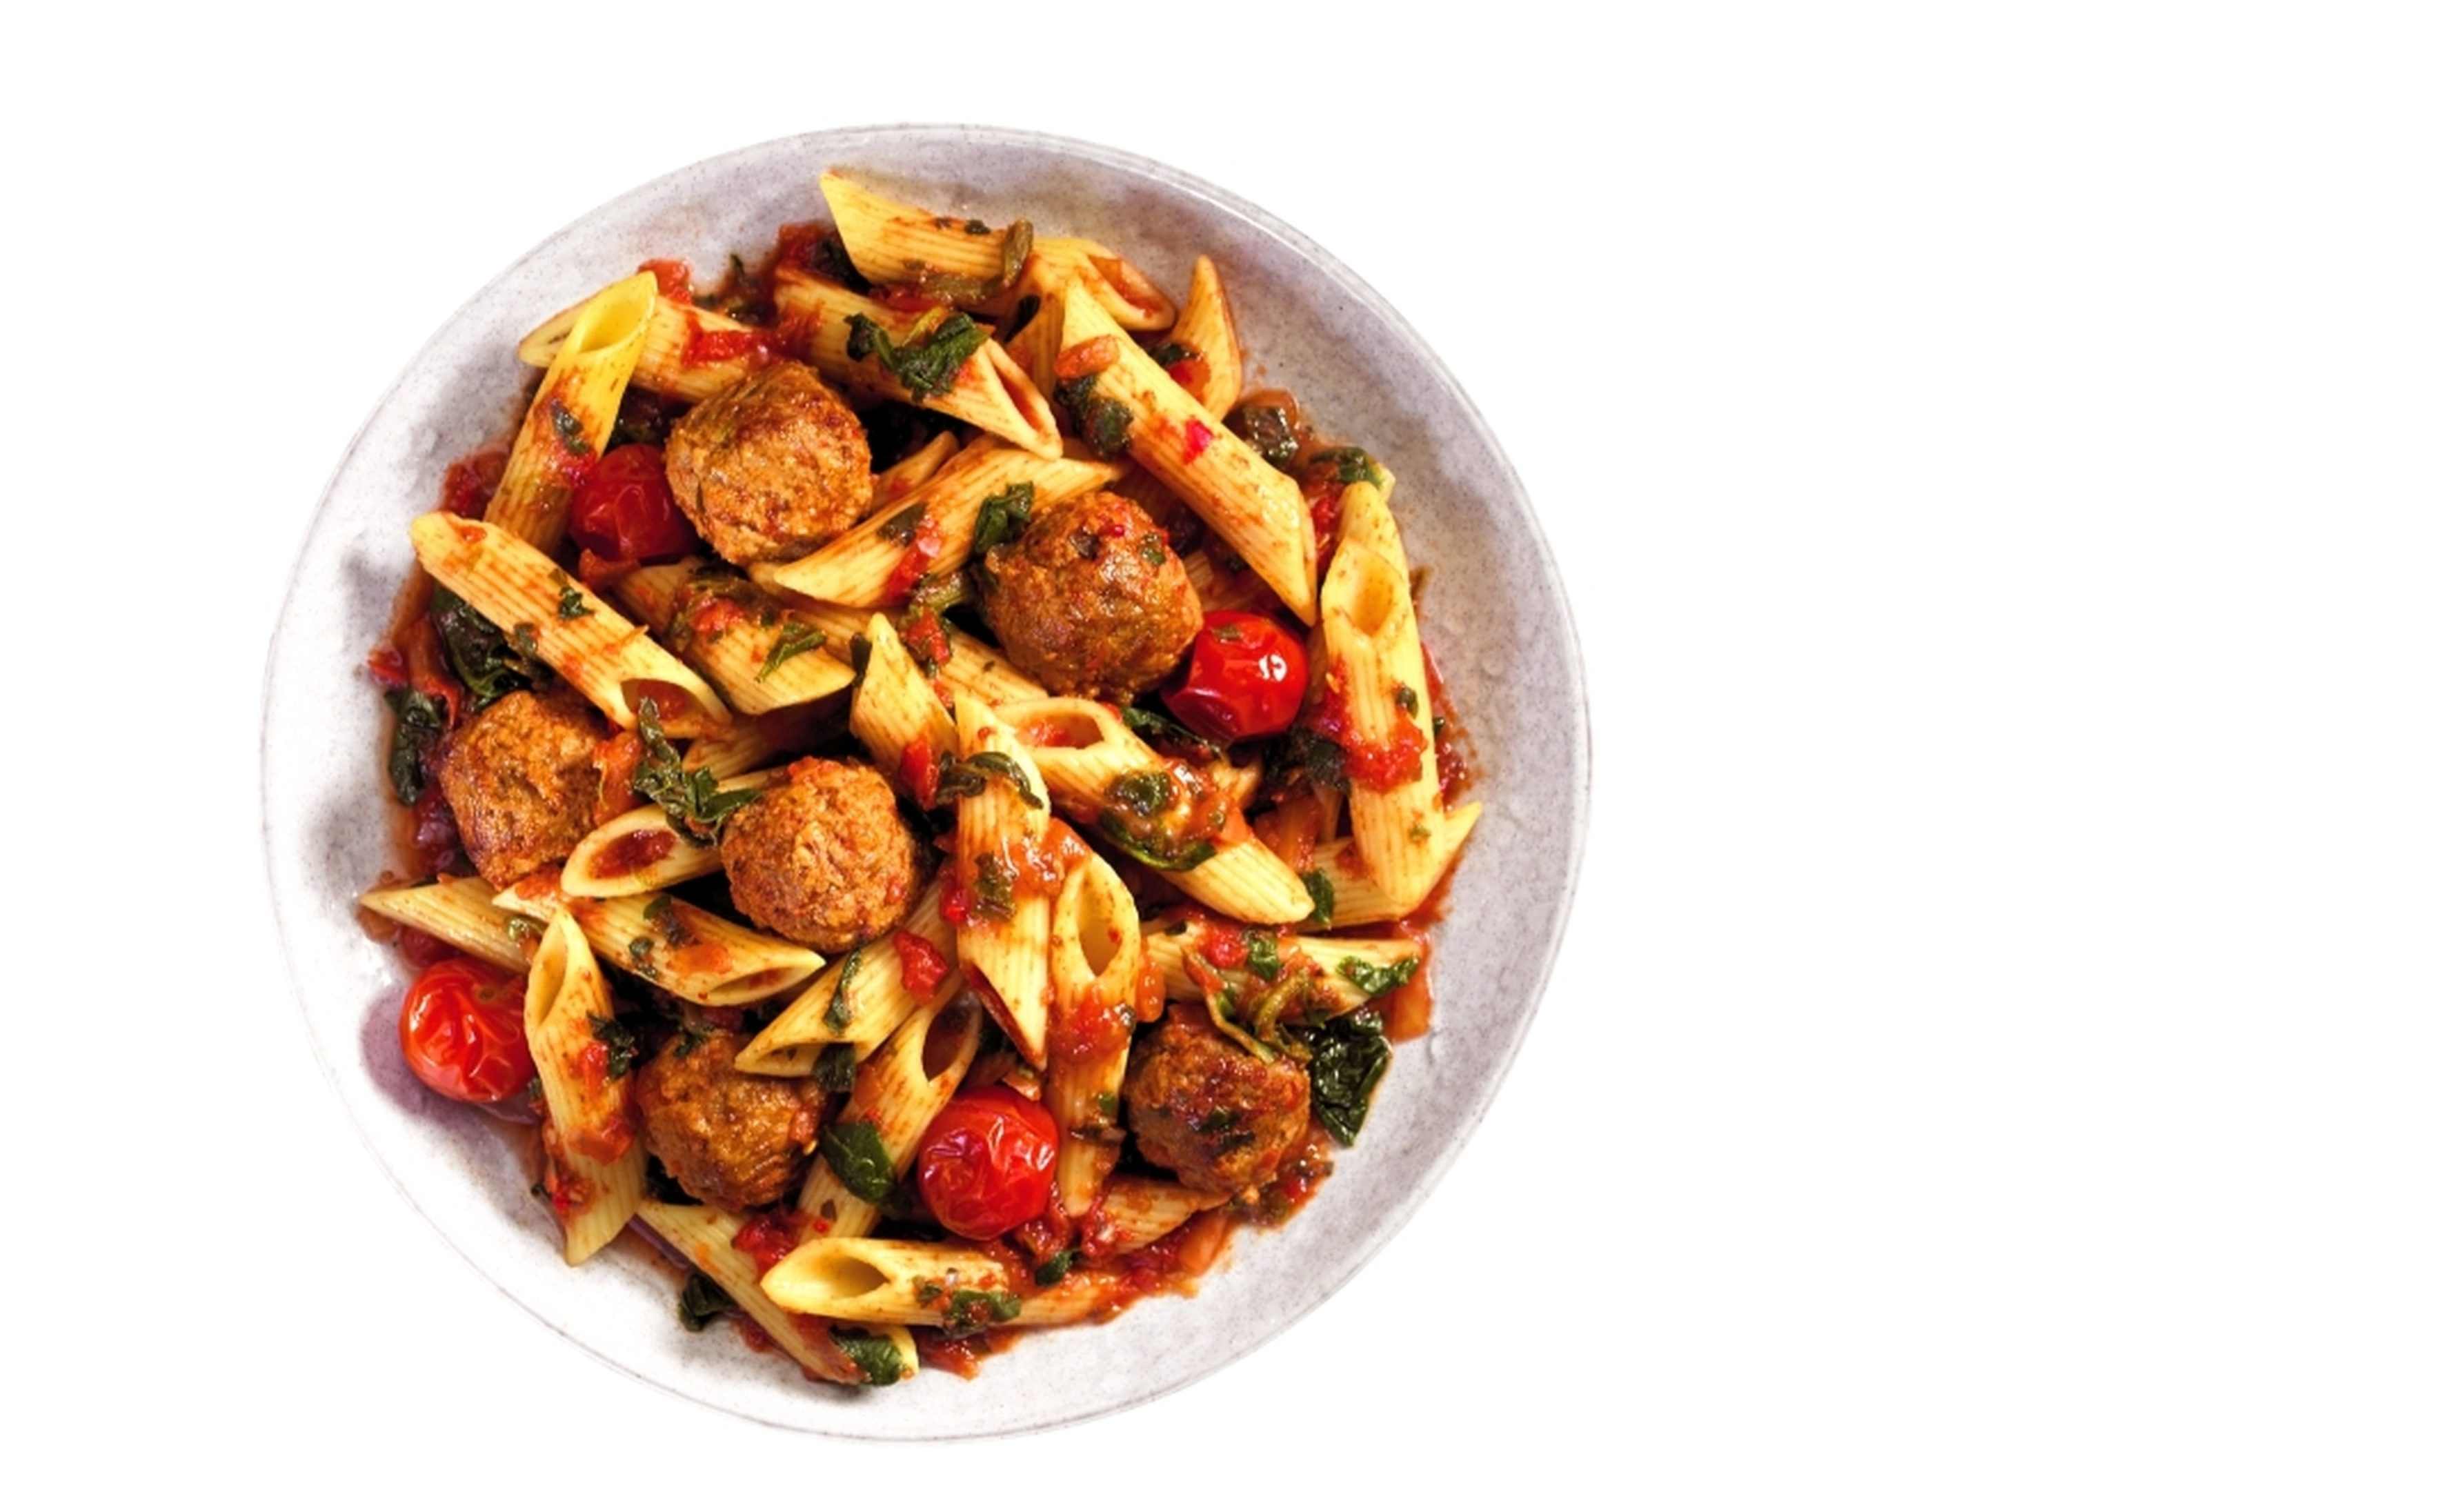 Aldi Slim Free Meatballs and Pasta (Aldi)